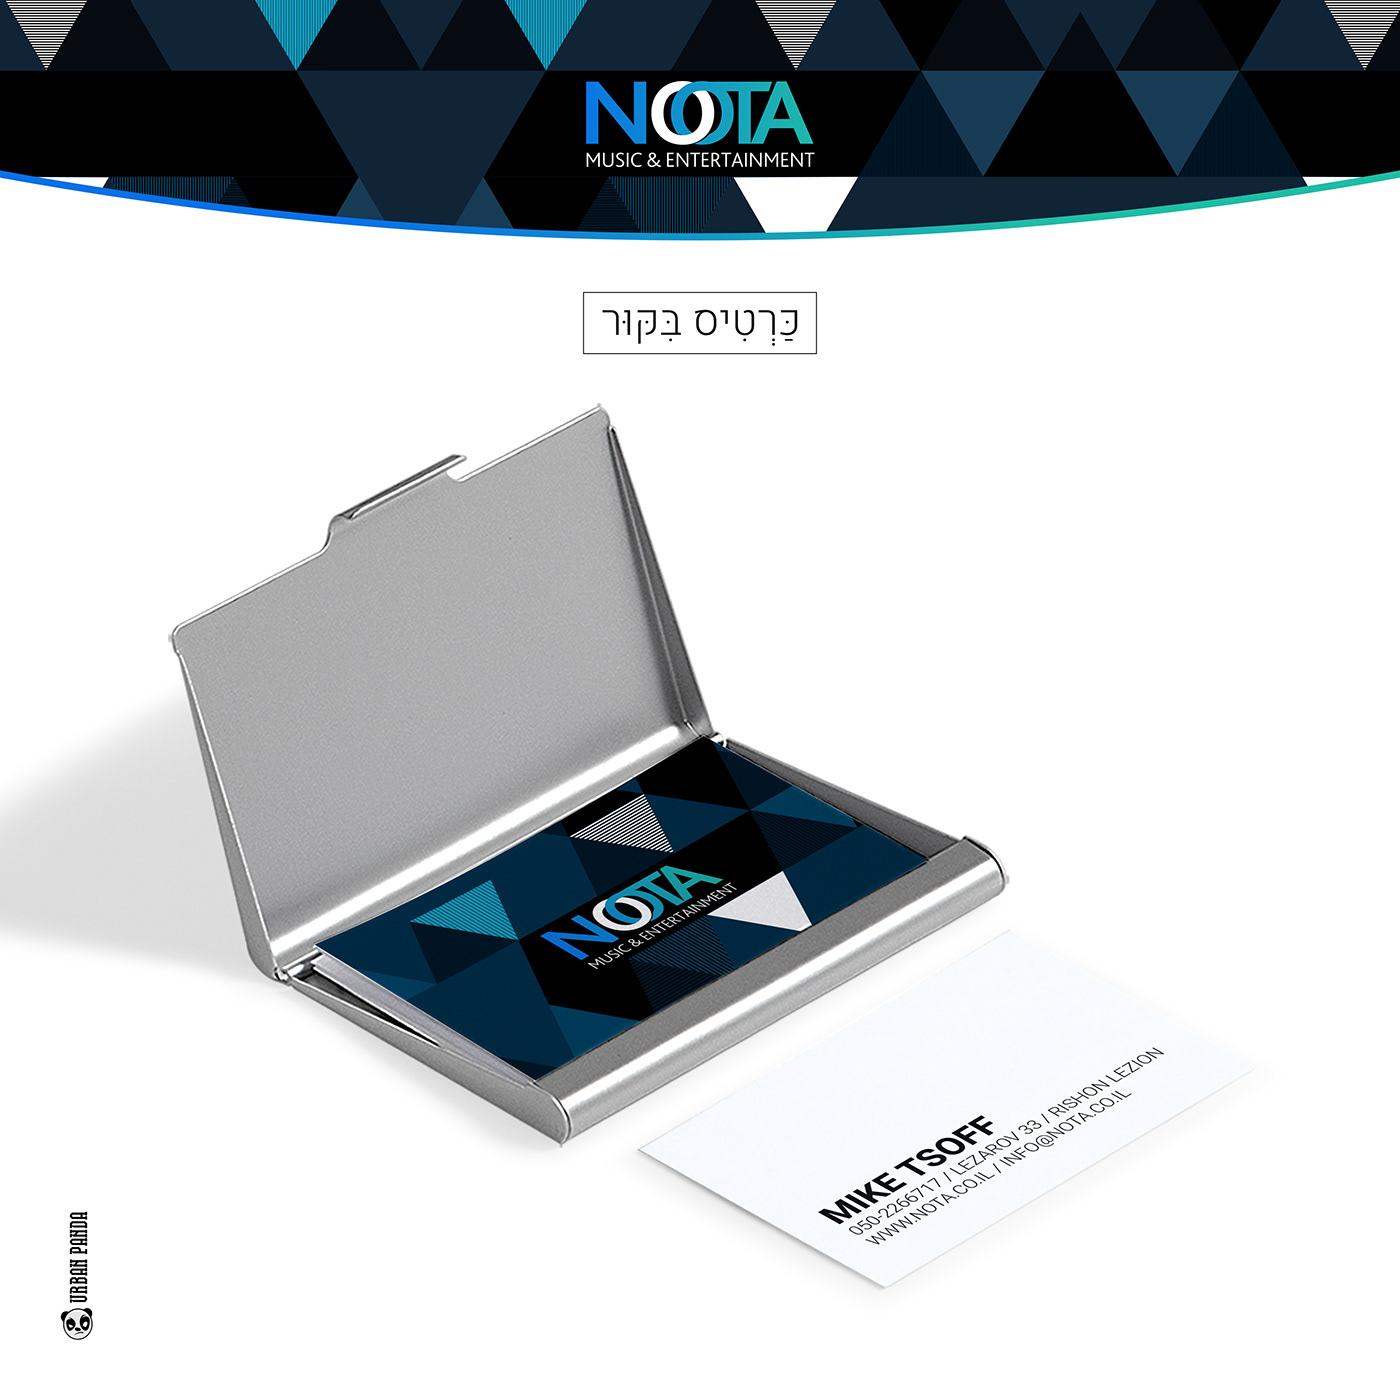 brand branding company Dj's logo Nota wedding